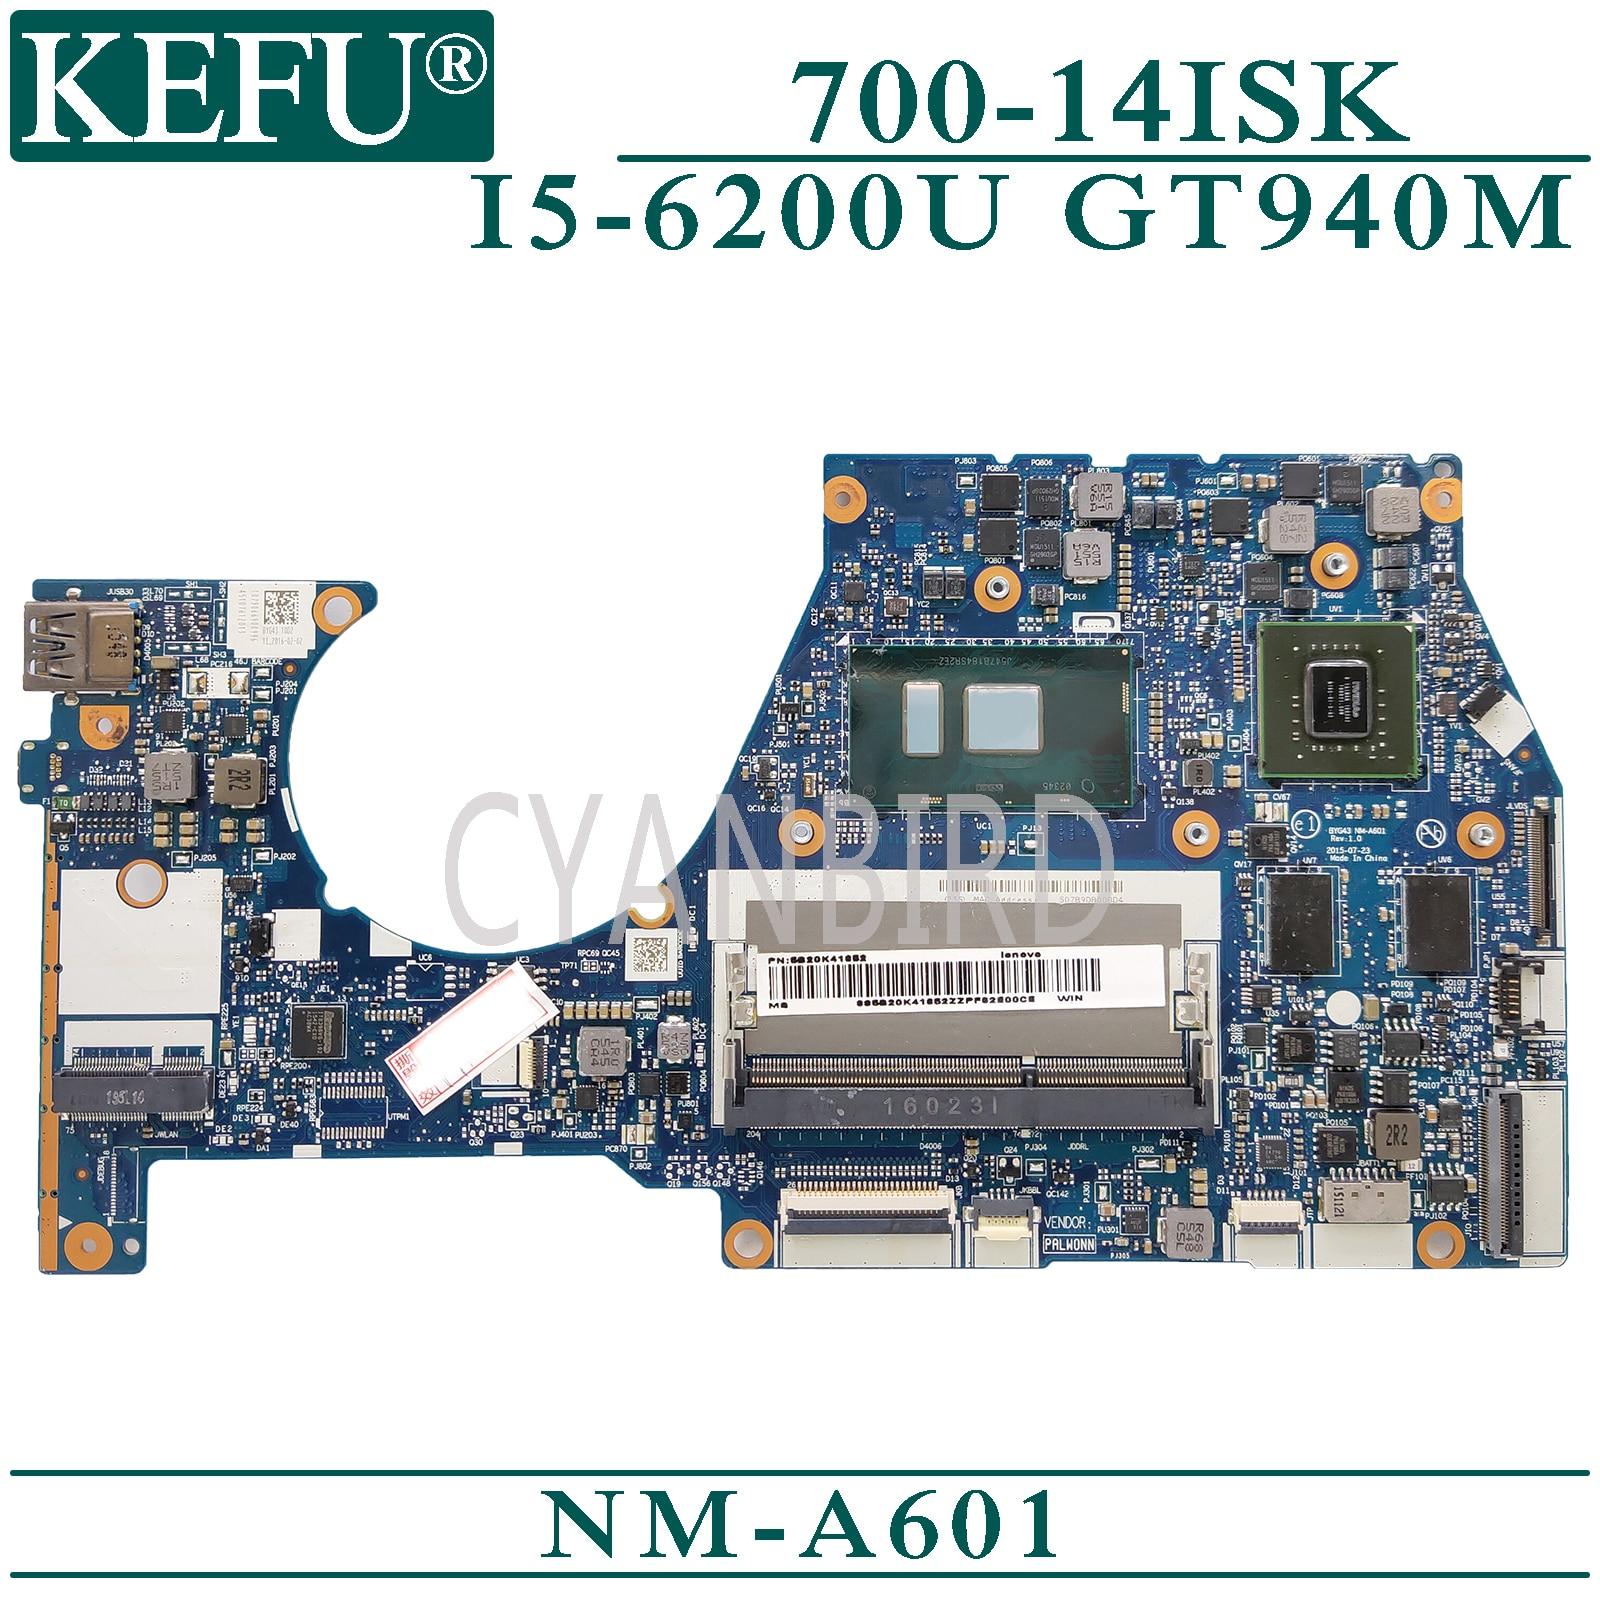 KEFU NM-A601 original mainboard for Lenovo YOGA 700-14ISK with I5-6200U GT940M Laptop motherboard